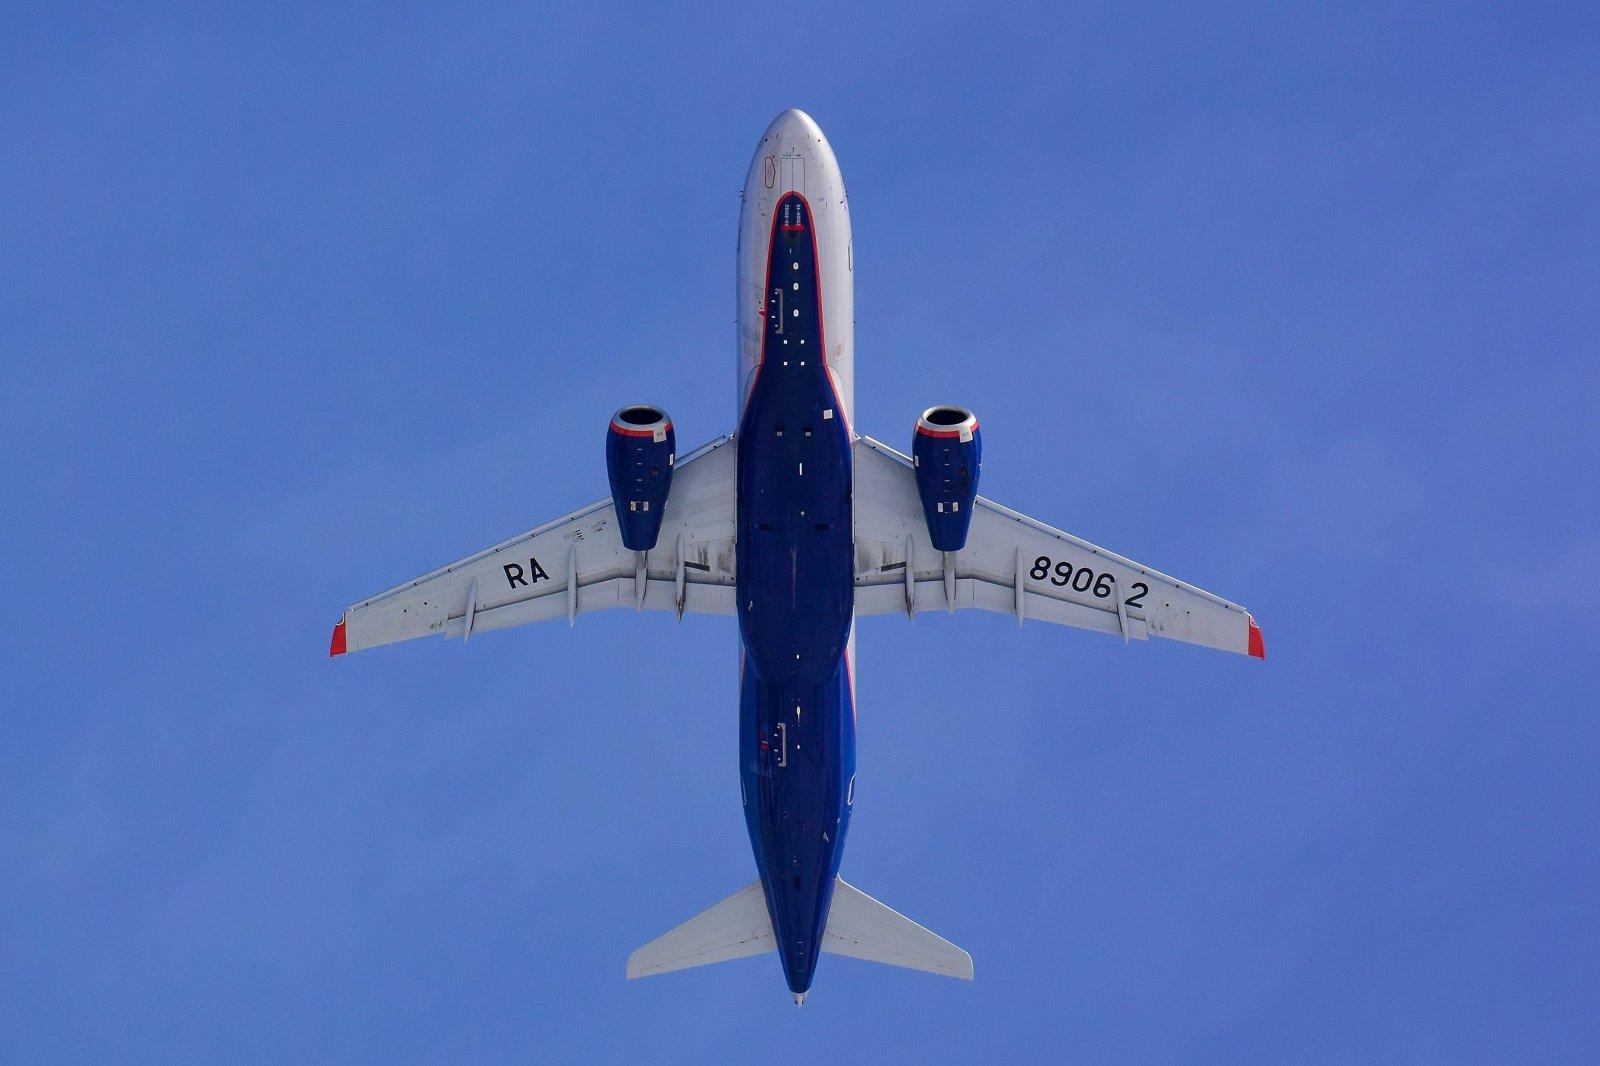 Sukhoi Superjet-100 - RA 89062